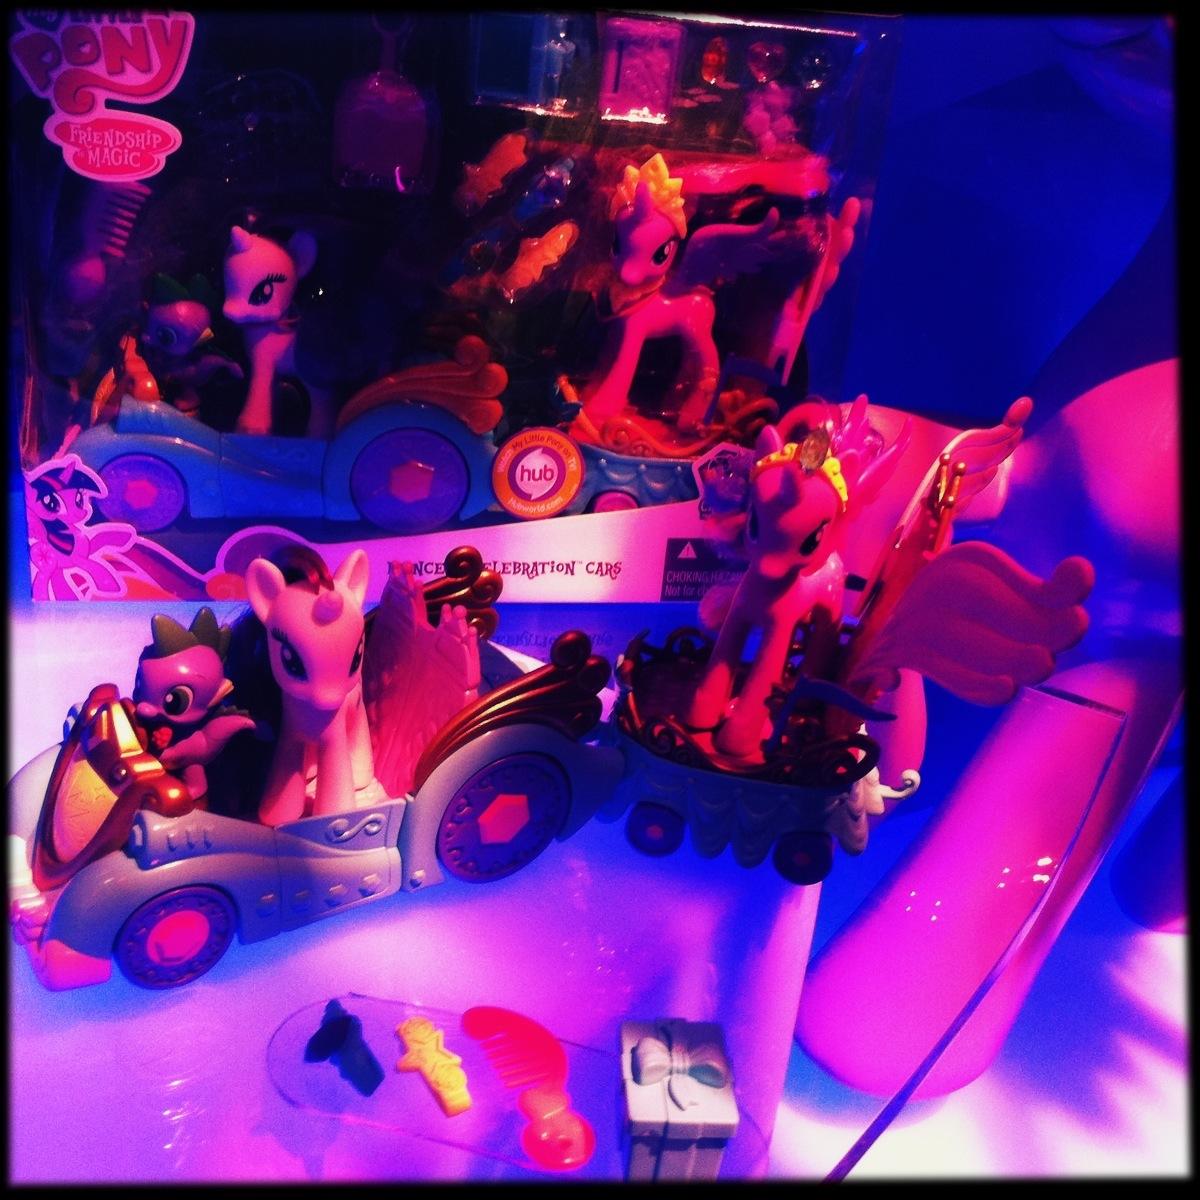 201-toyfair-hasbro4.JPG